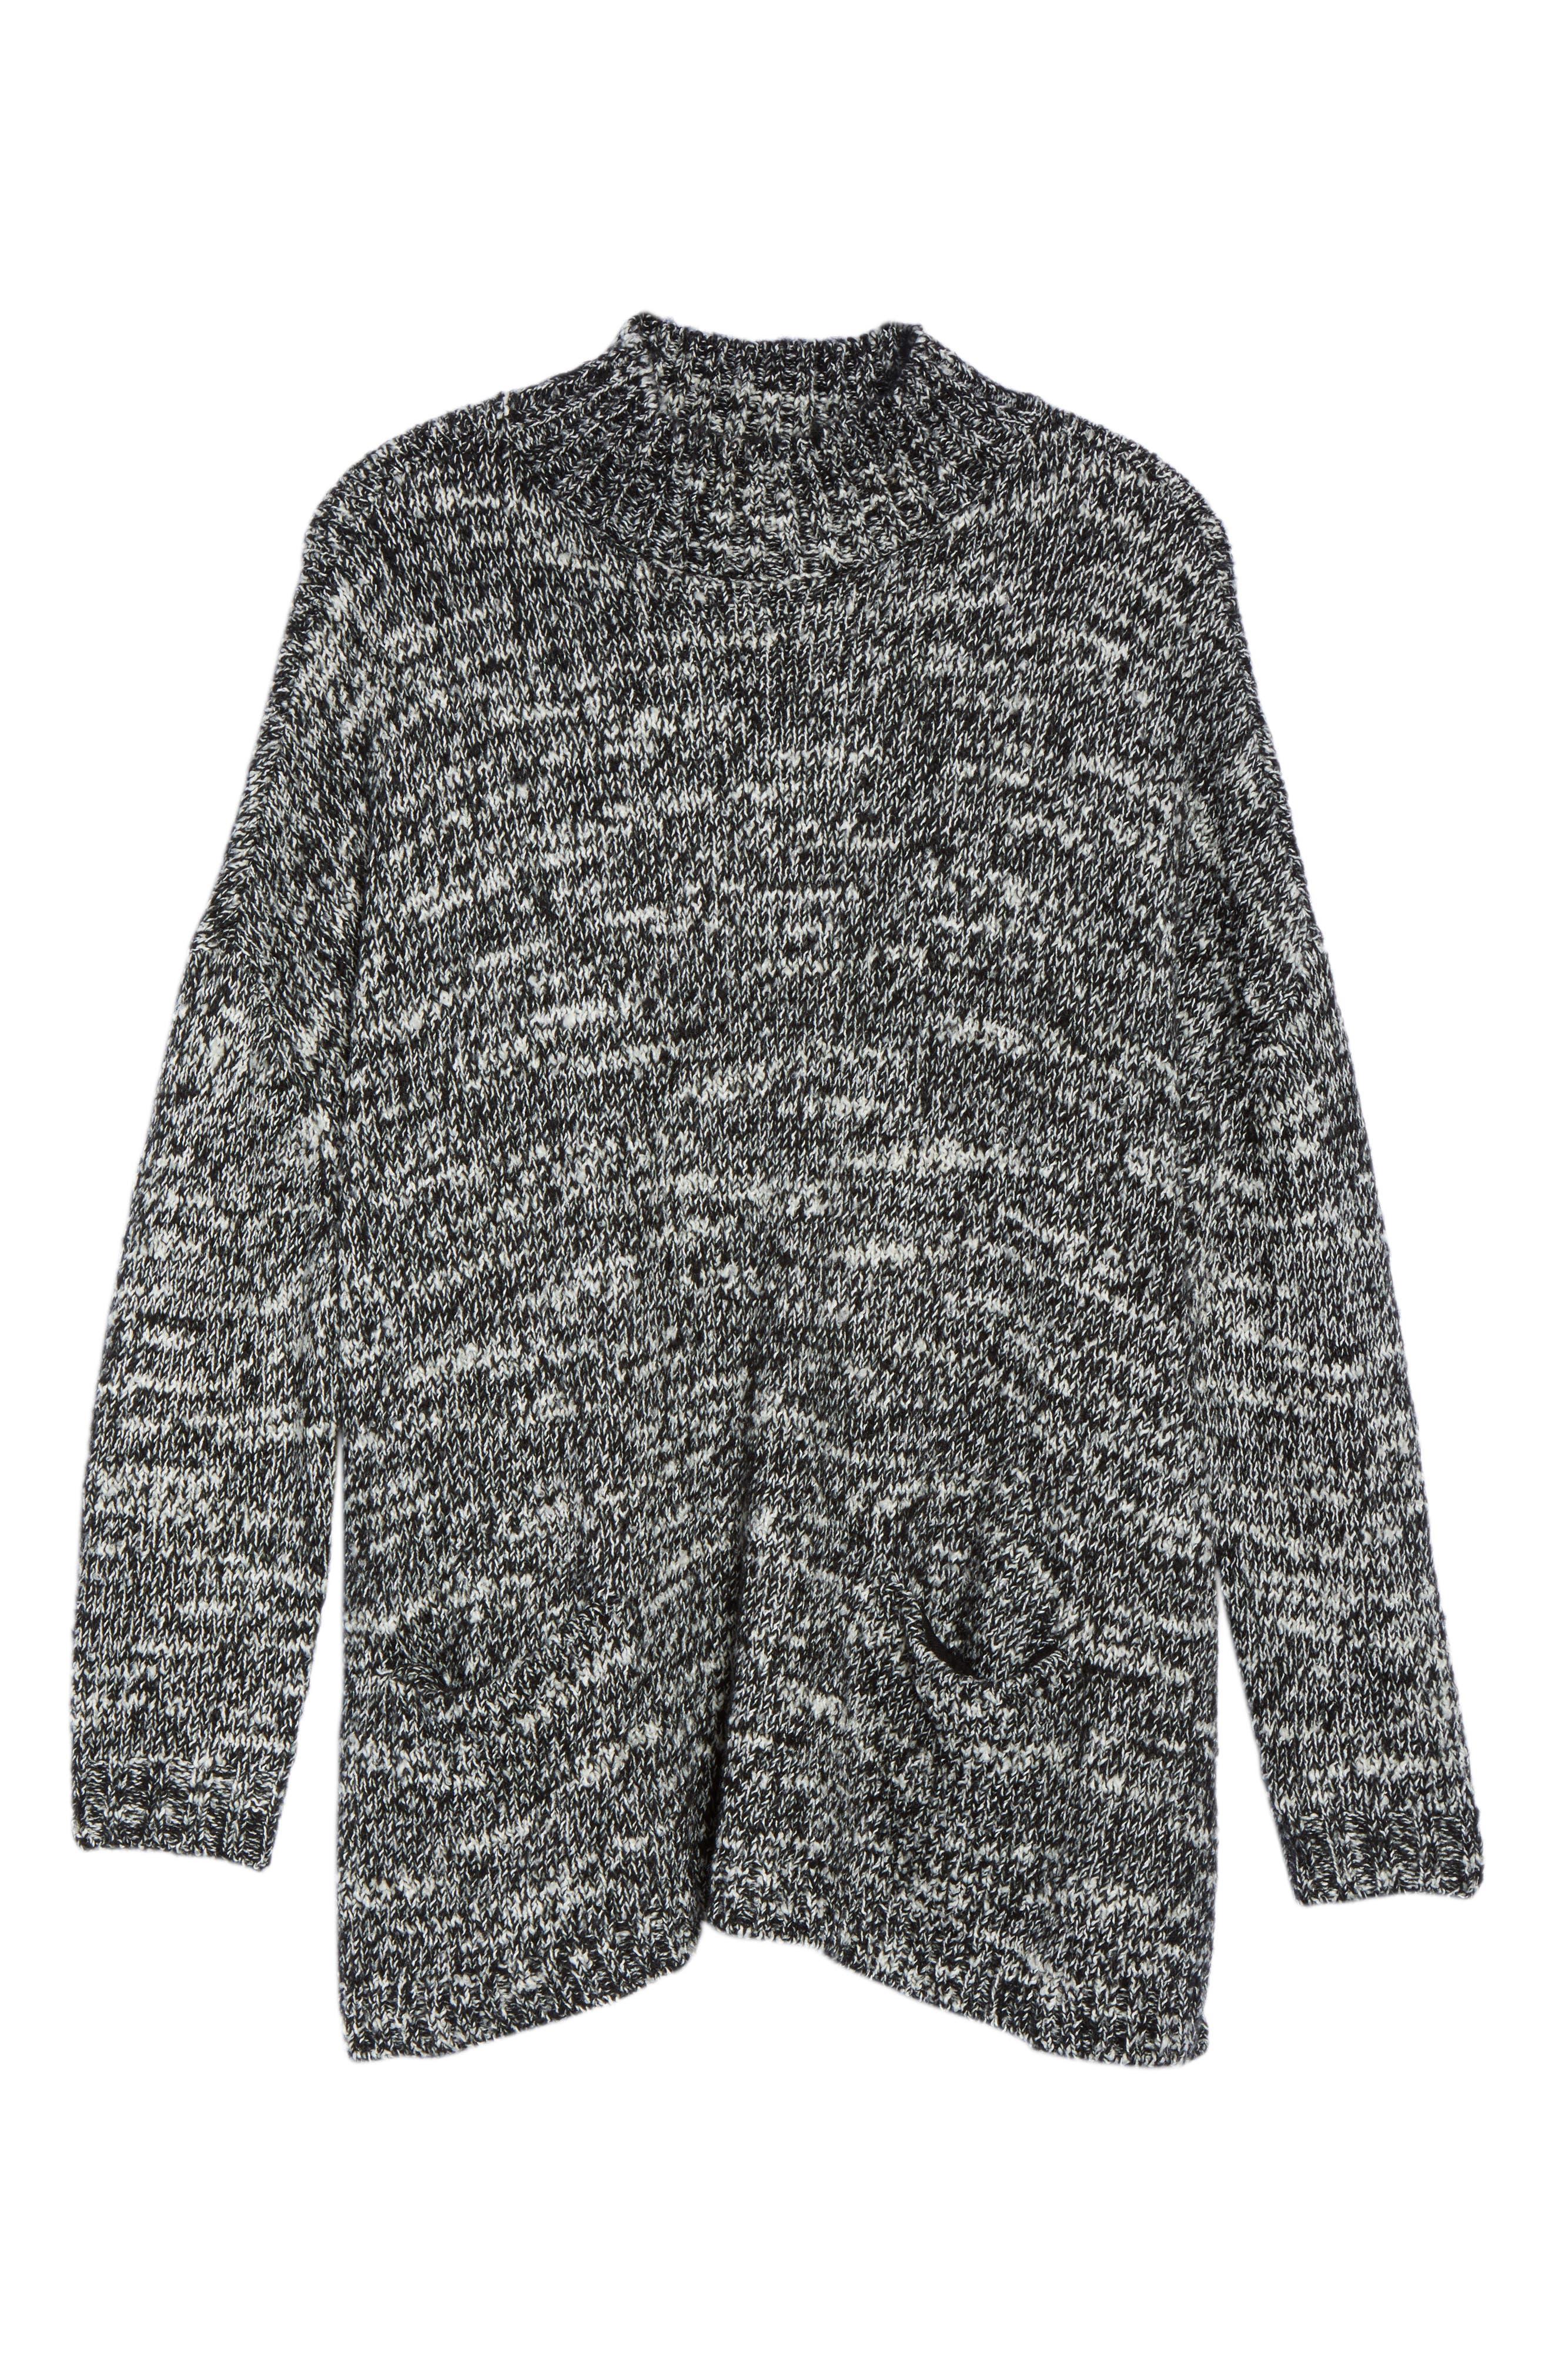 Mock Neck Knit Sweater,                             Alternate thumbnail 6, color,                             001